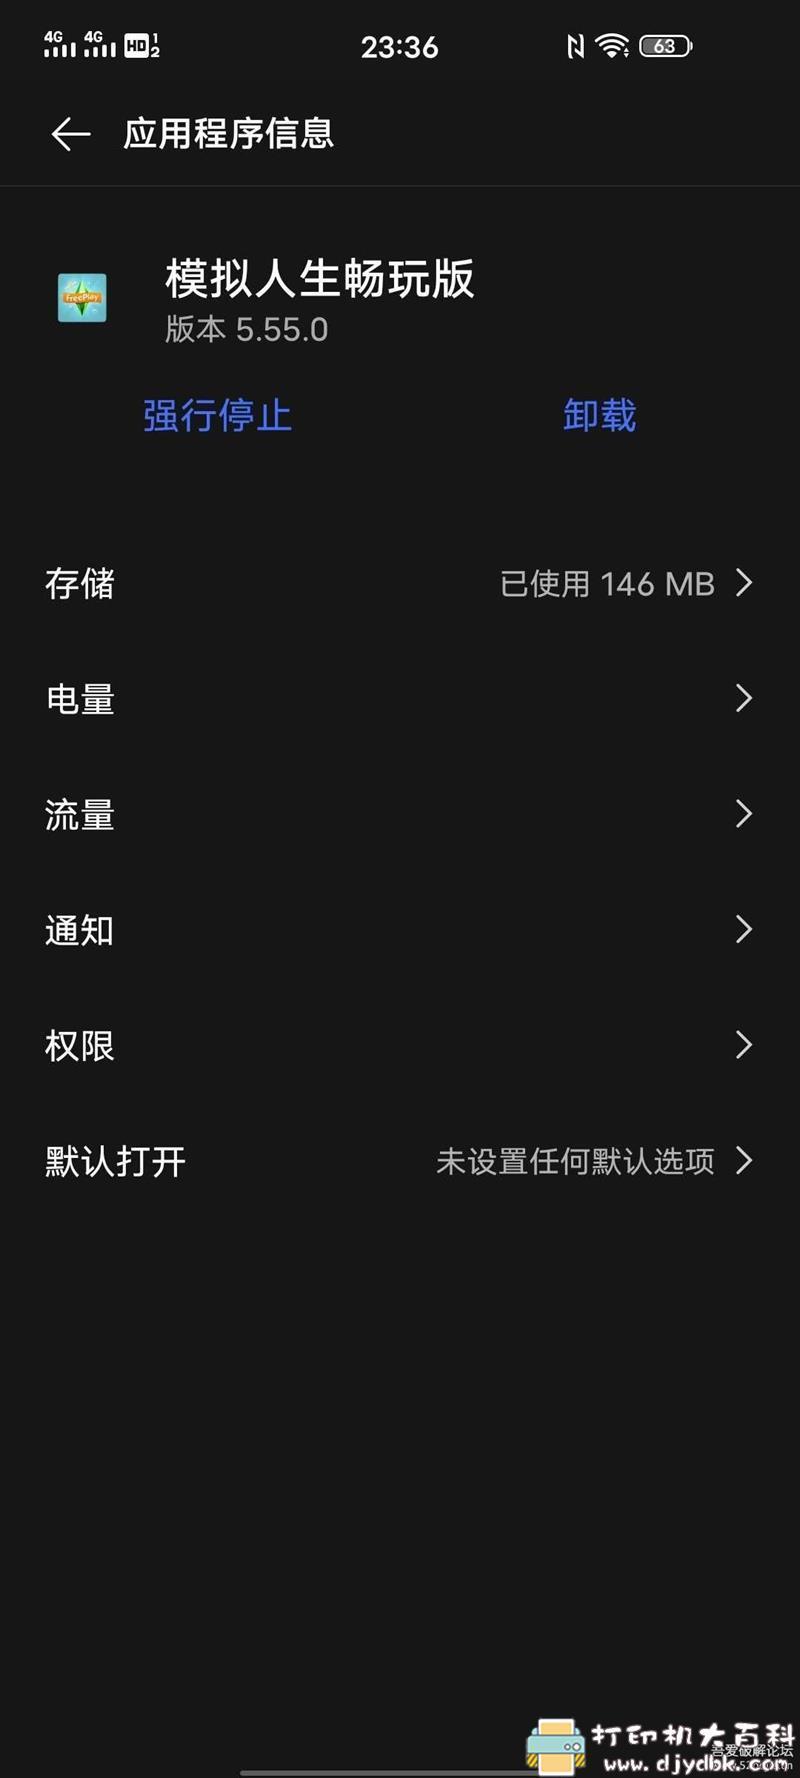 安卓游戏分享:模拟人生FreePlay v5.55.0 SUPER MOD APK 配图 No.2